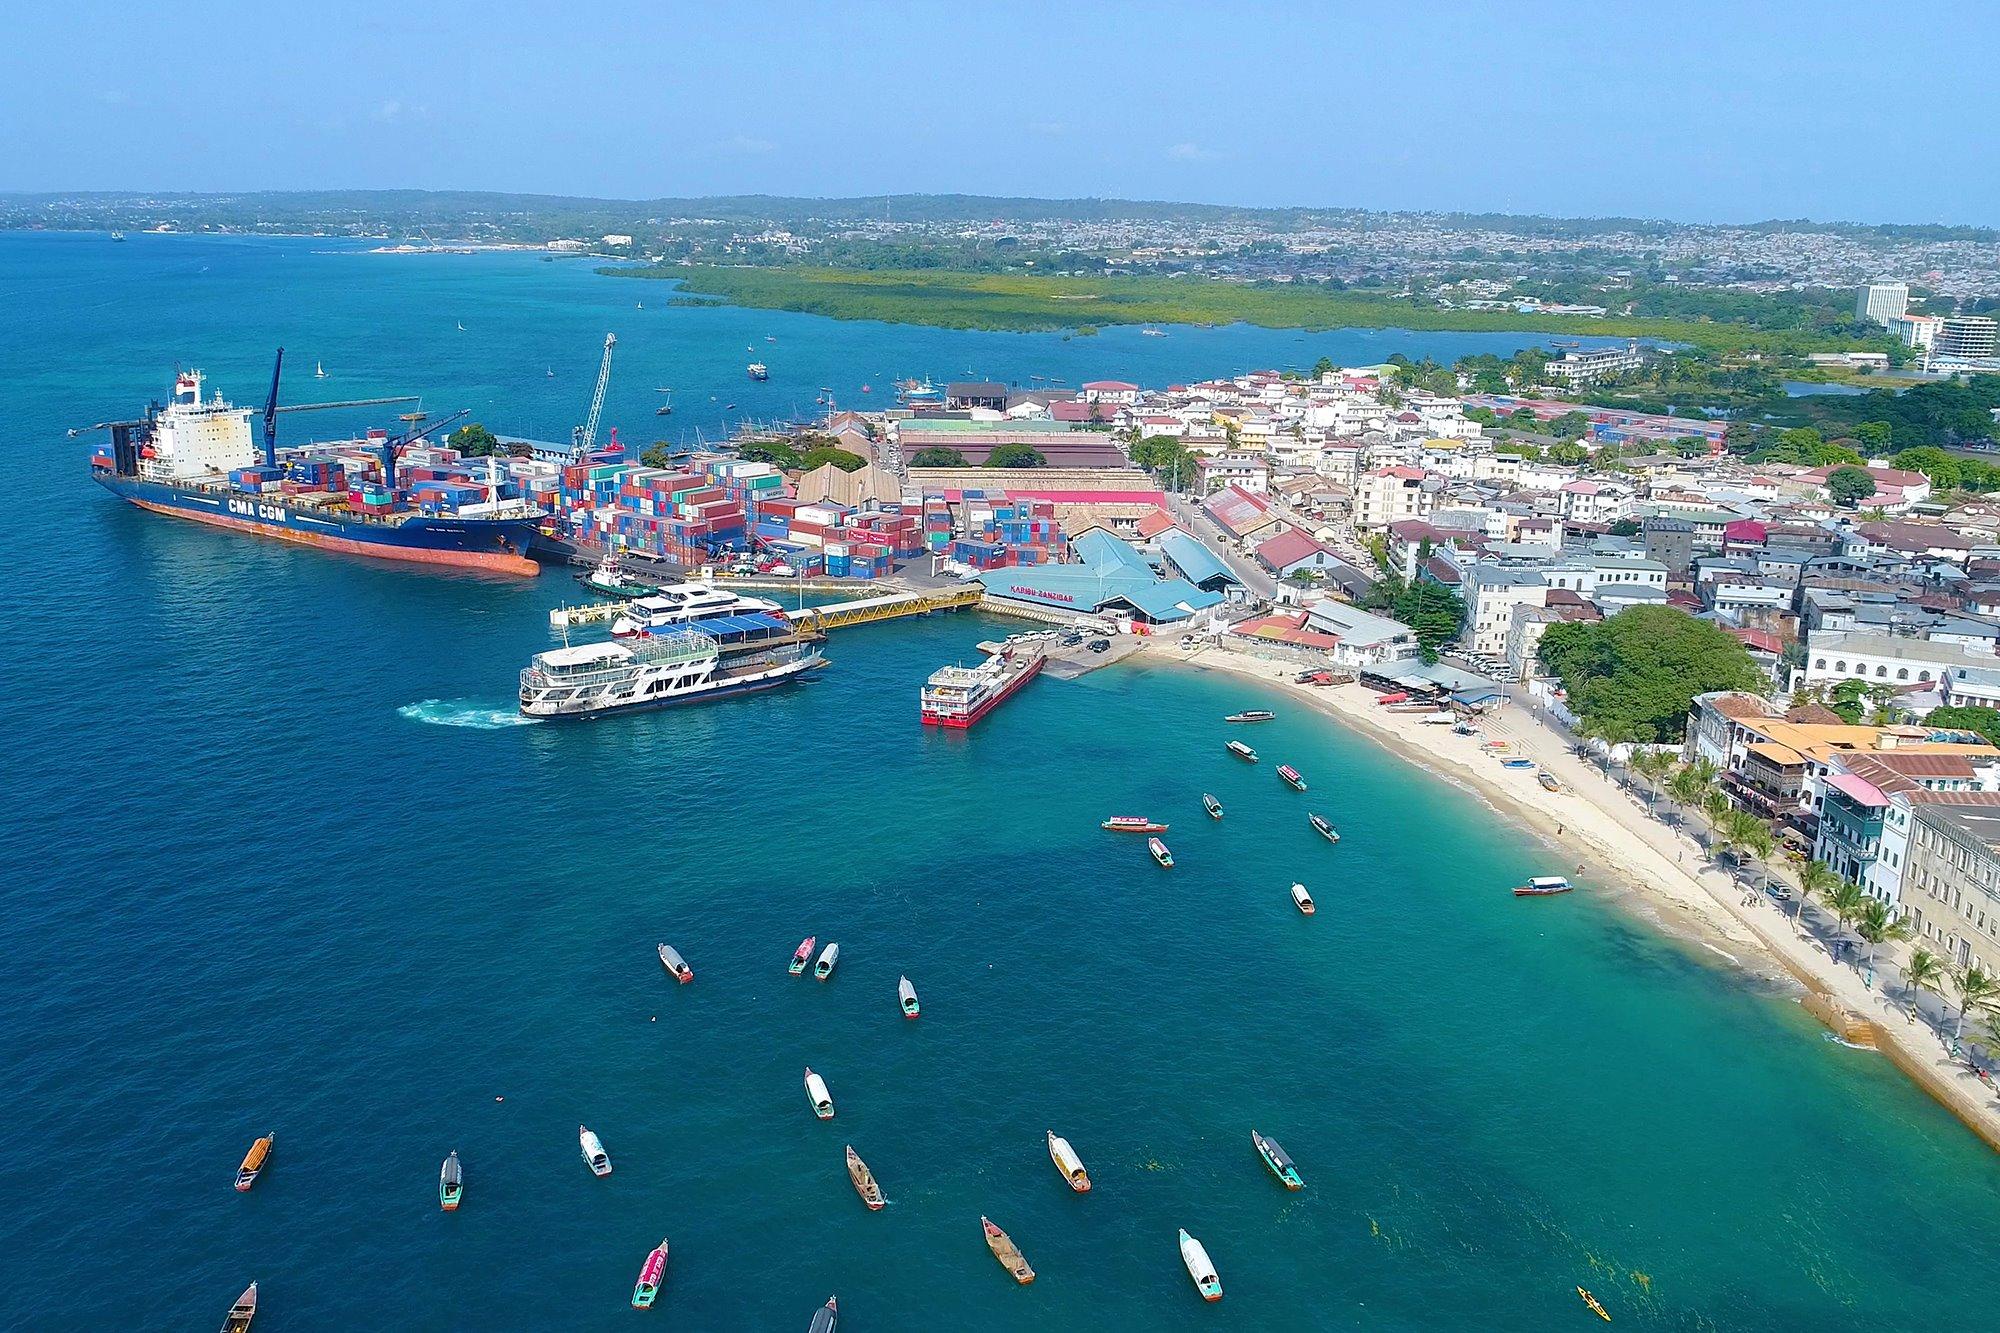 Aerial View Stone Town Zanzibar